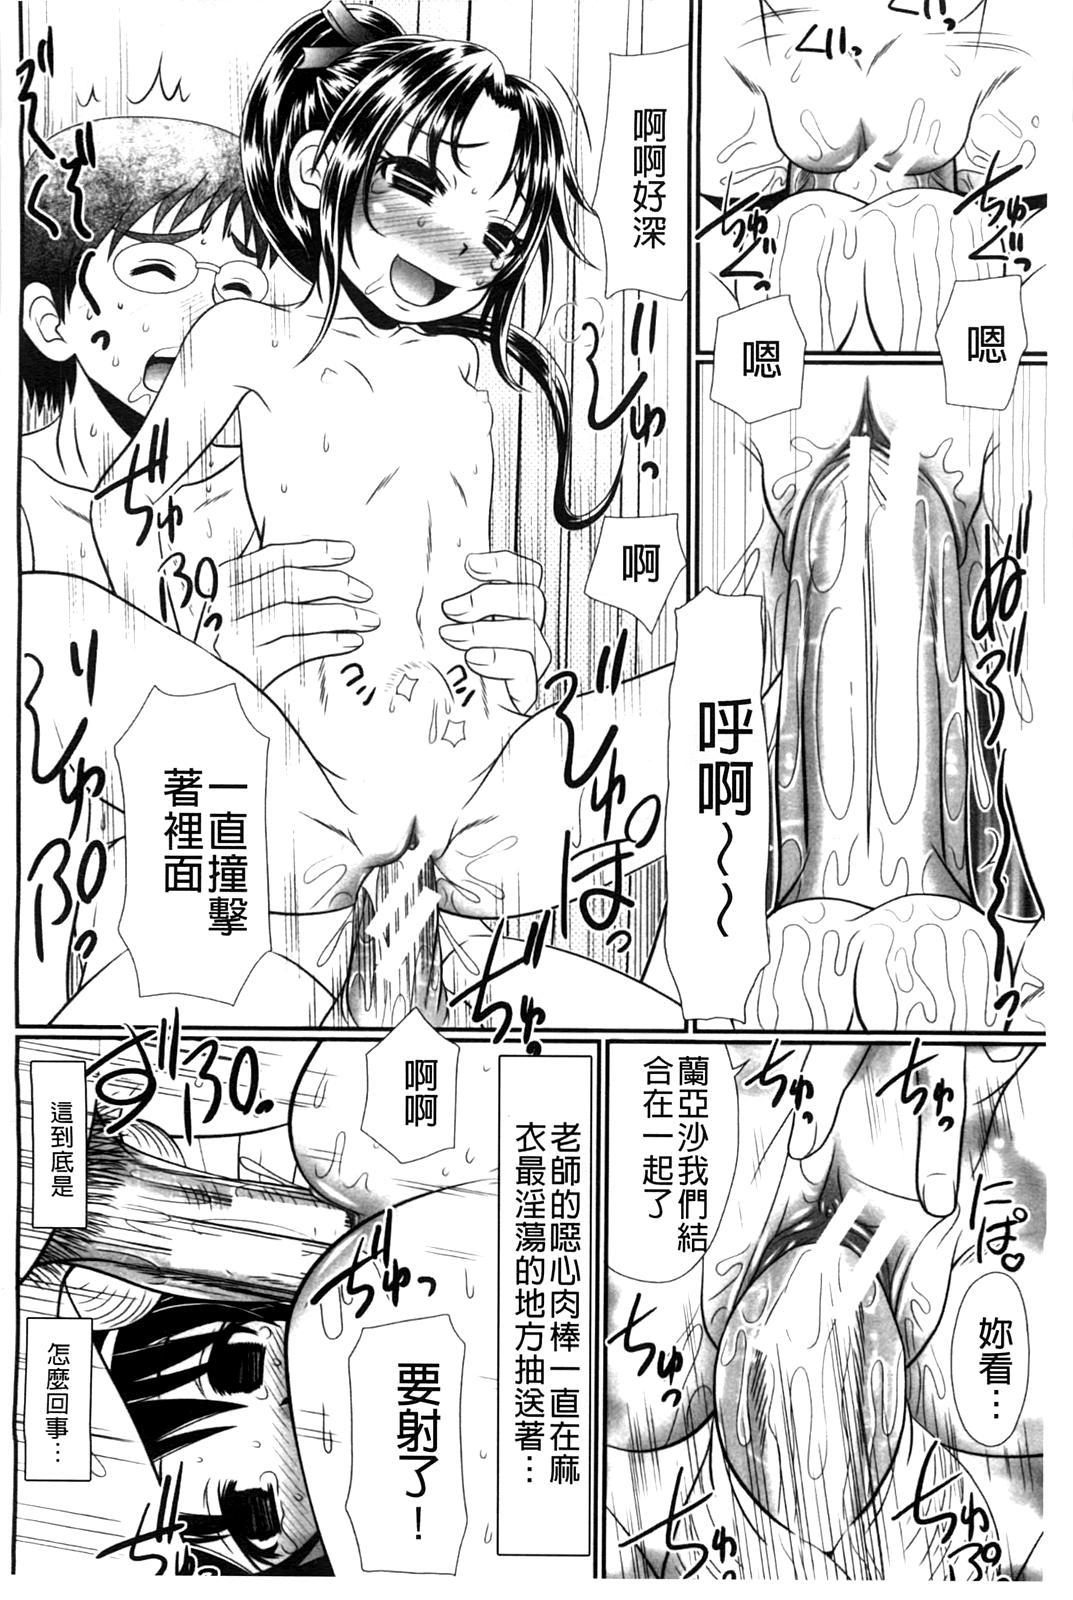 Higyaku Kyoushitsu 128